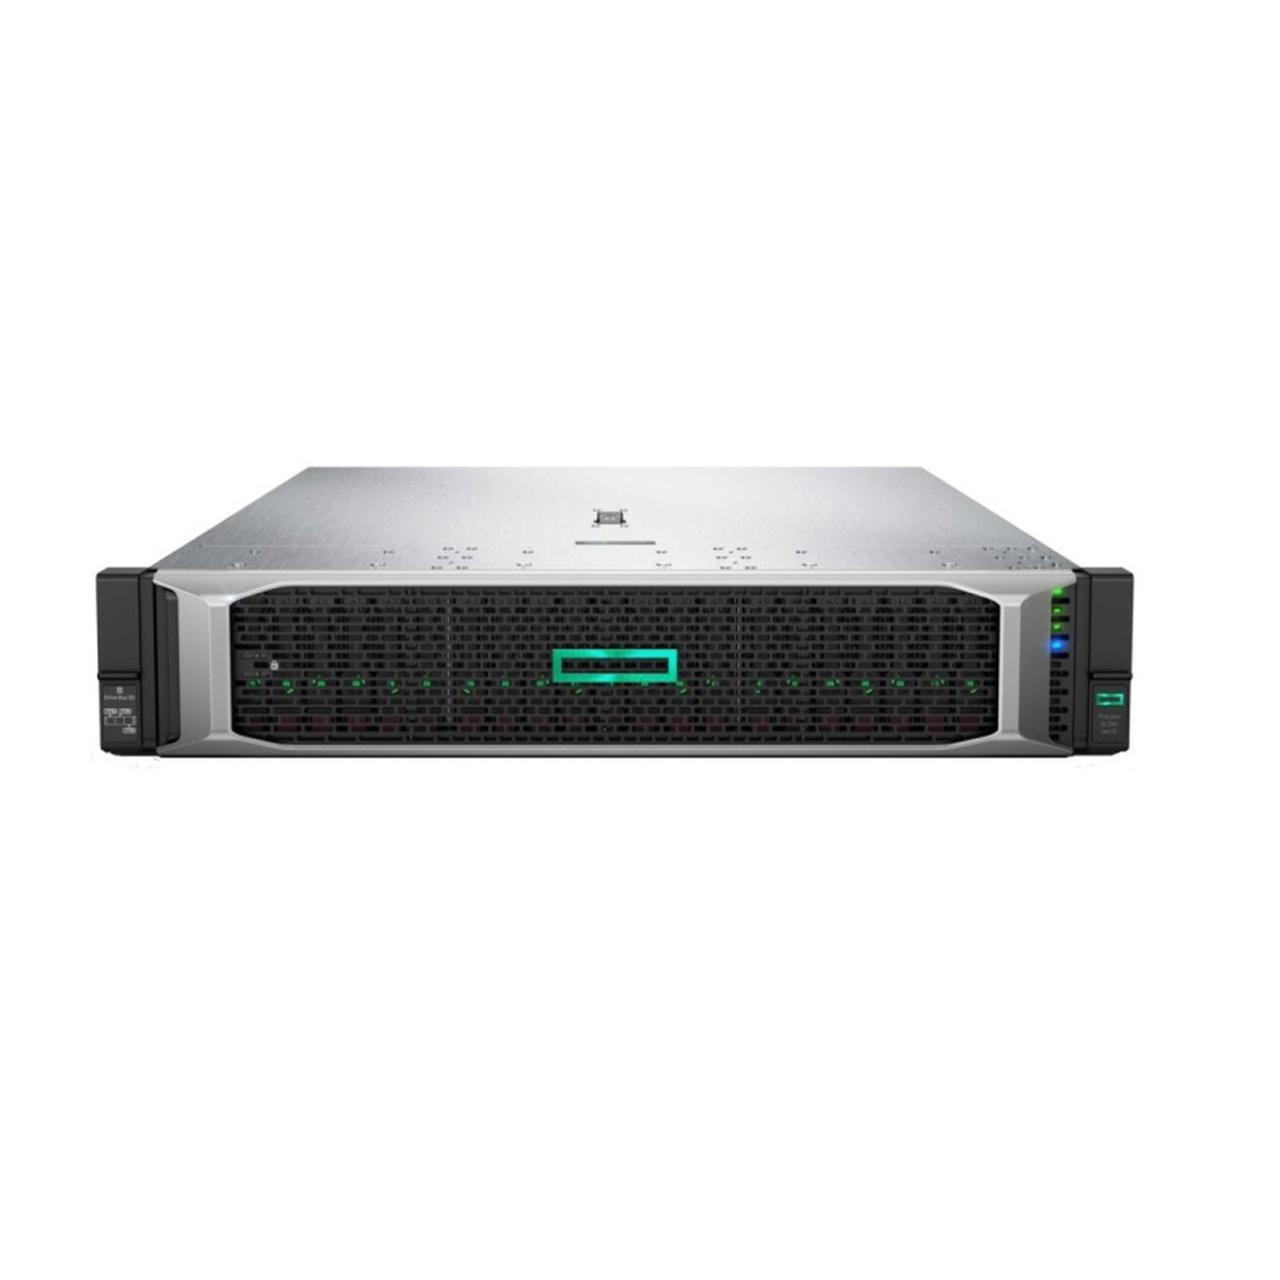 HPE ProLiant DL380 Gen10 4208 1P 16GB-R P408i-a 8SFF 500W PS Server ( P02462-B21) ,Server PC